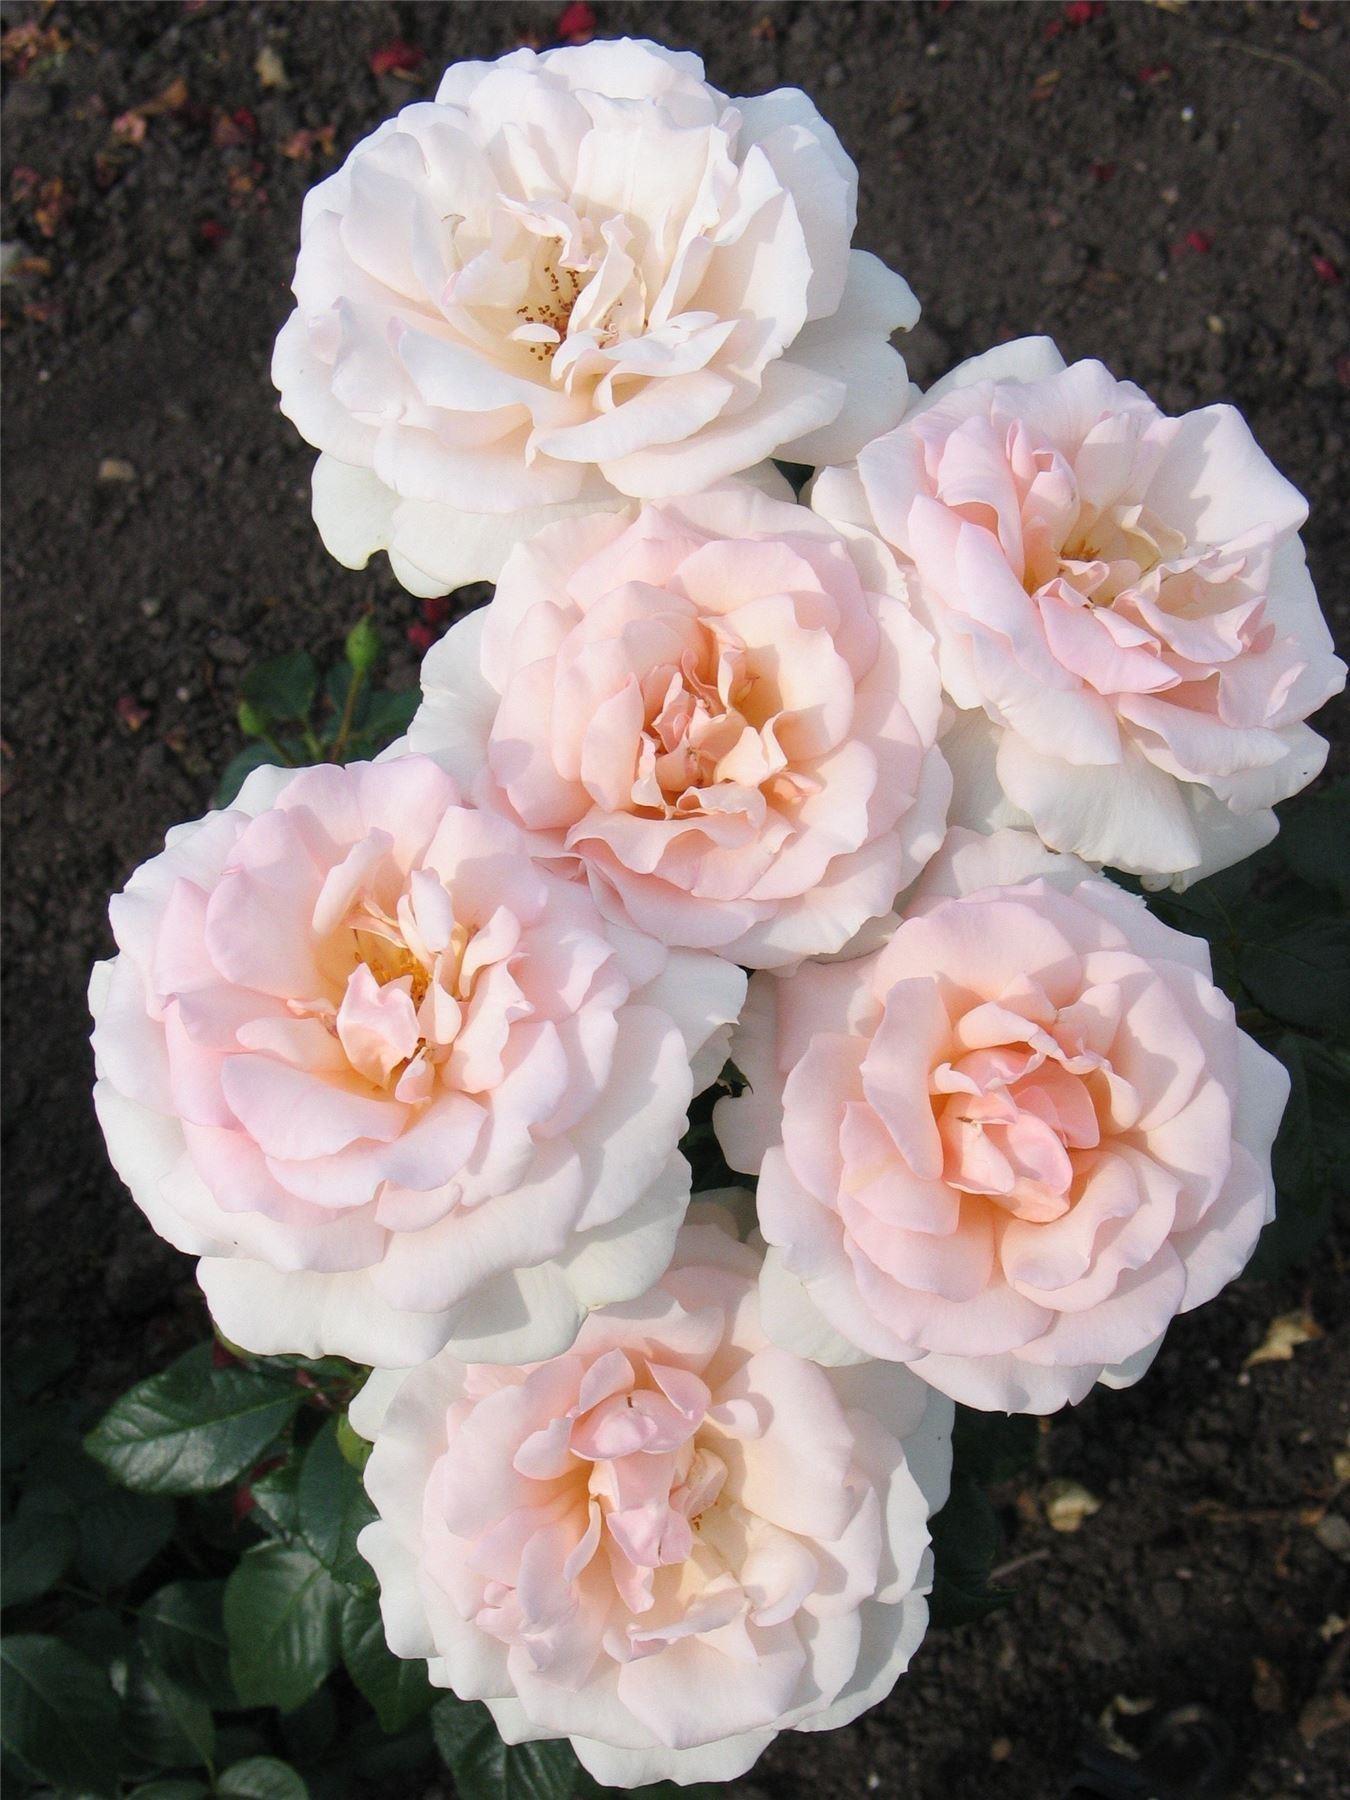 Rose A Whiter Shade Of Pale Hybrid Tea Rose